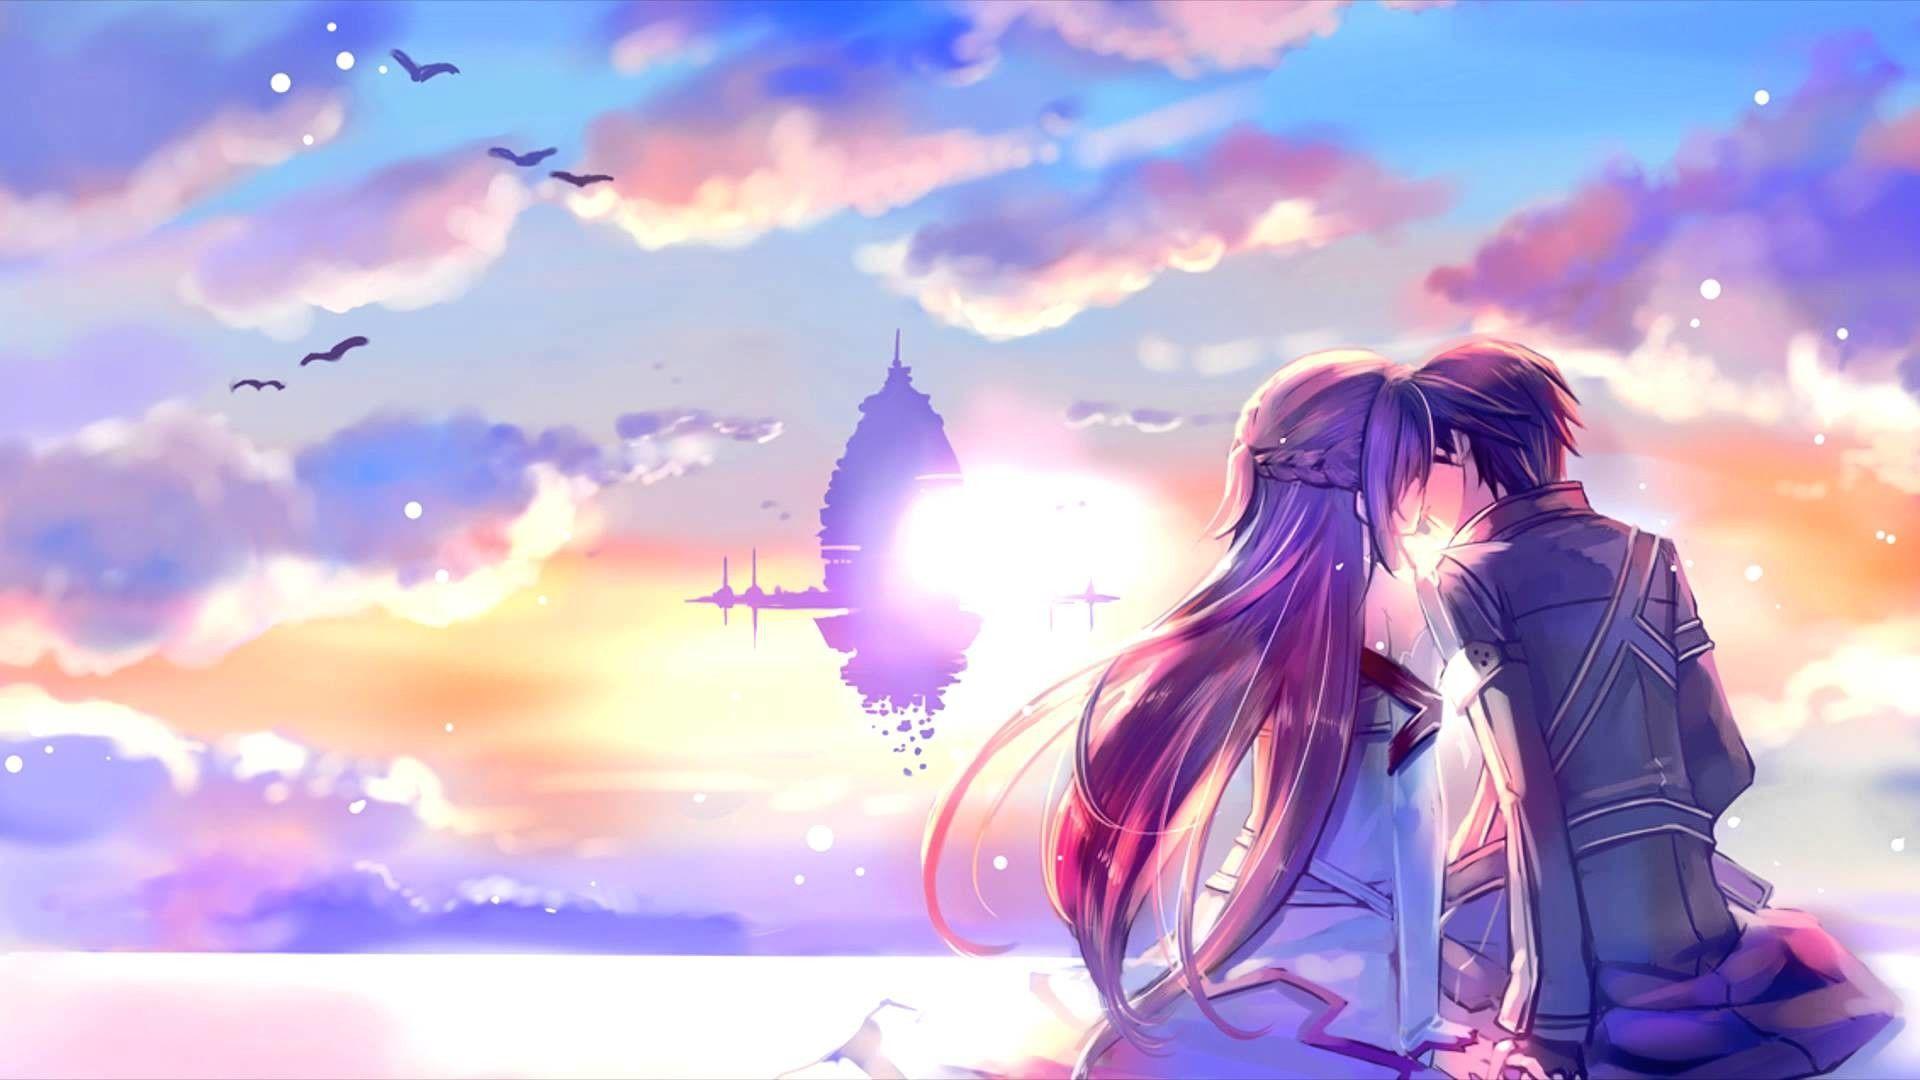 Animax Cartoon Wallpaper animax romantic wallpapers - wallpaper cave